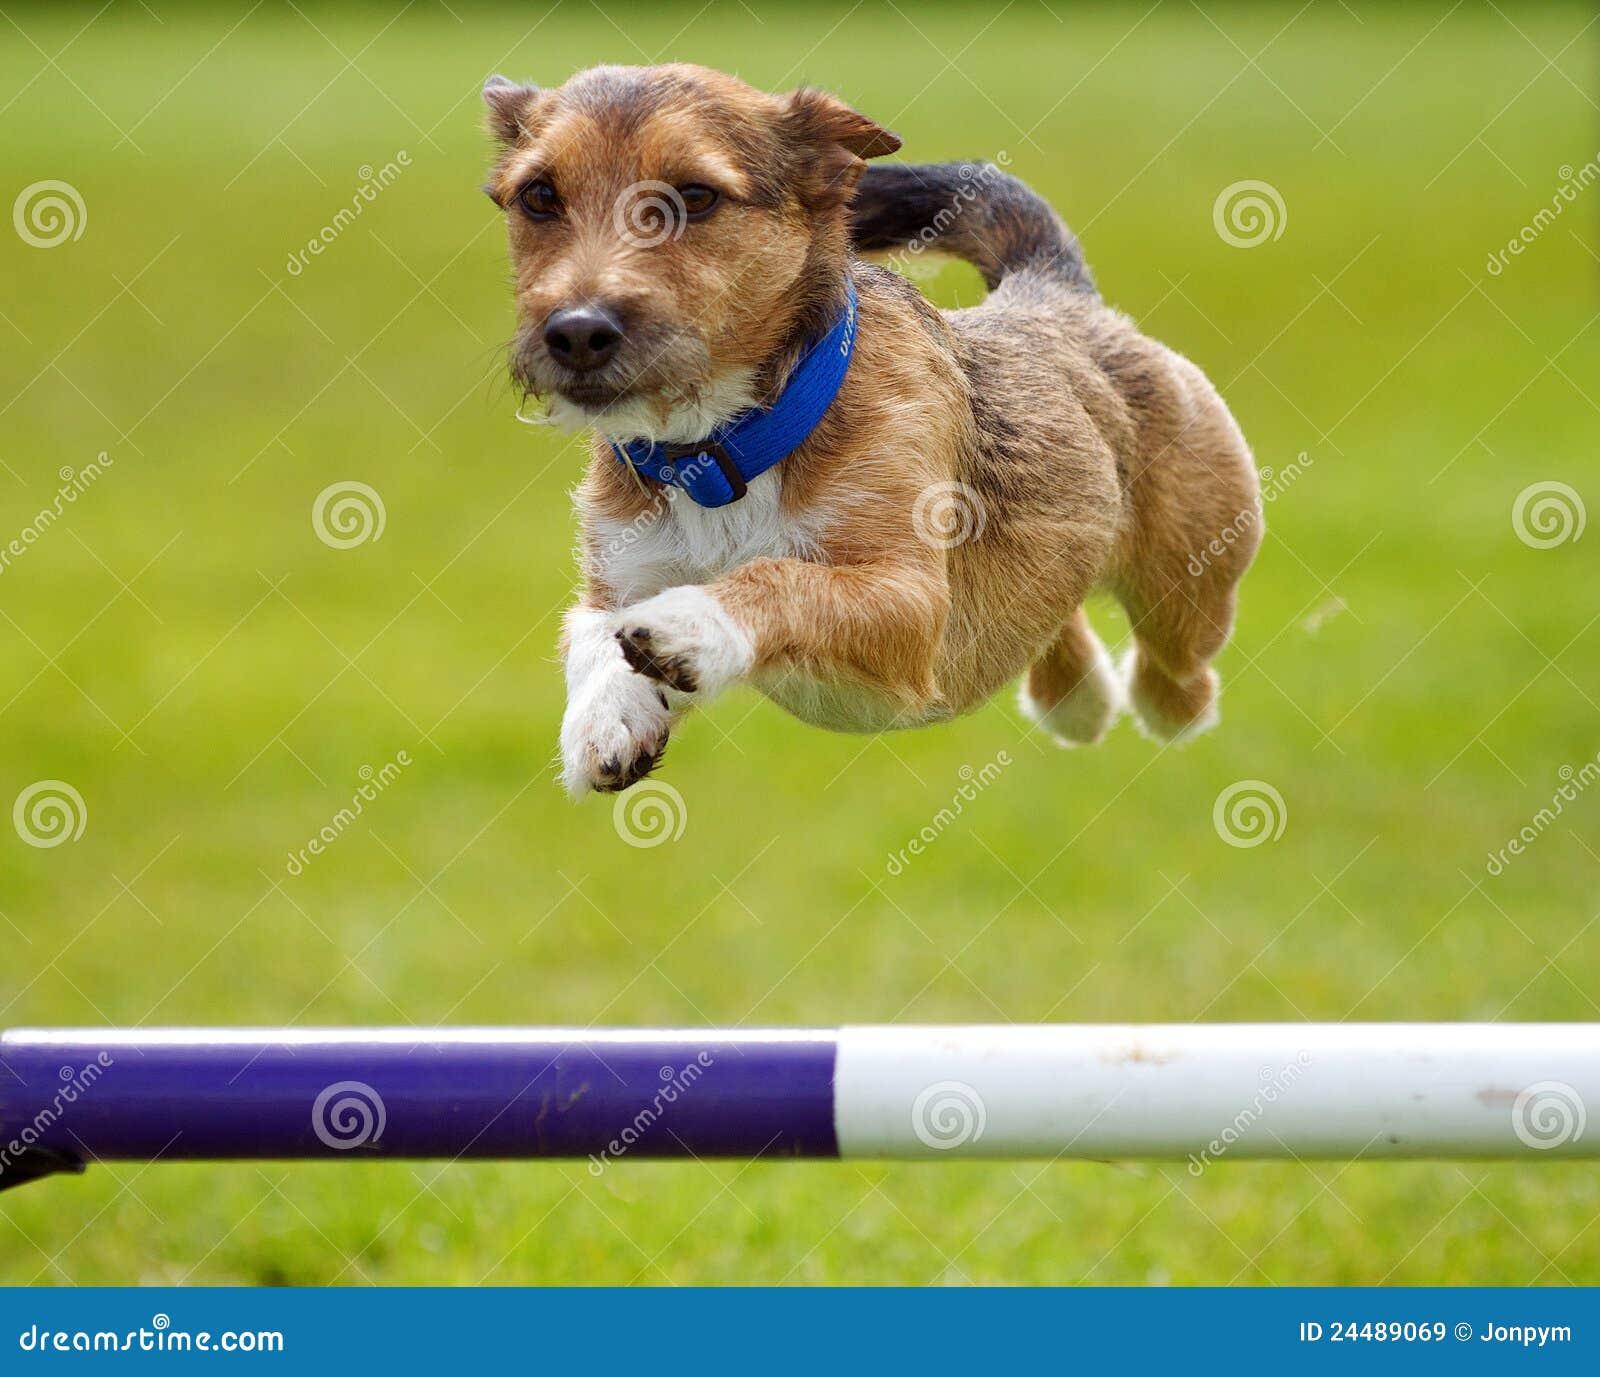 Dog training jumping on visitors